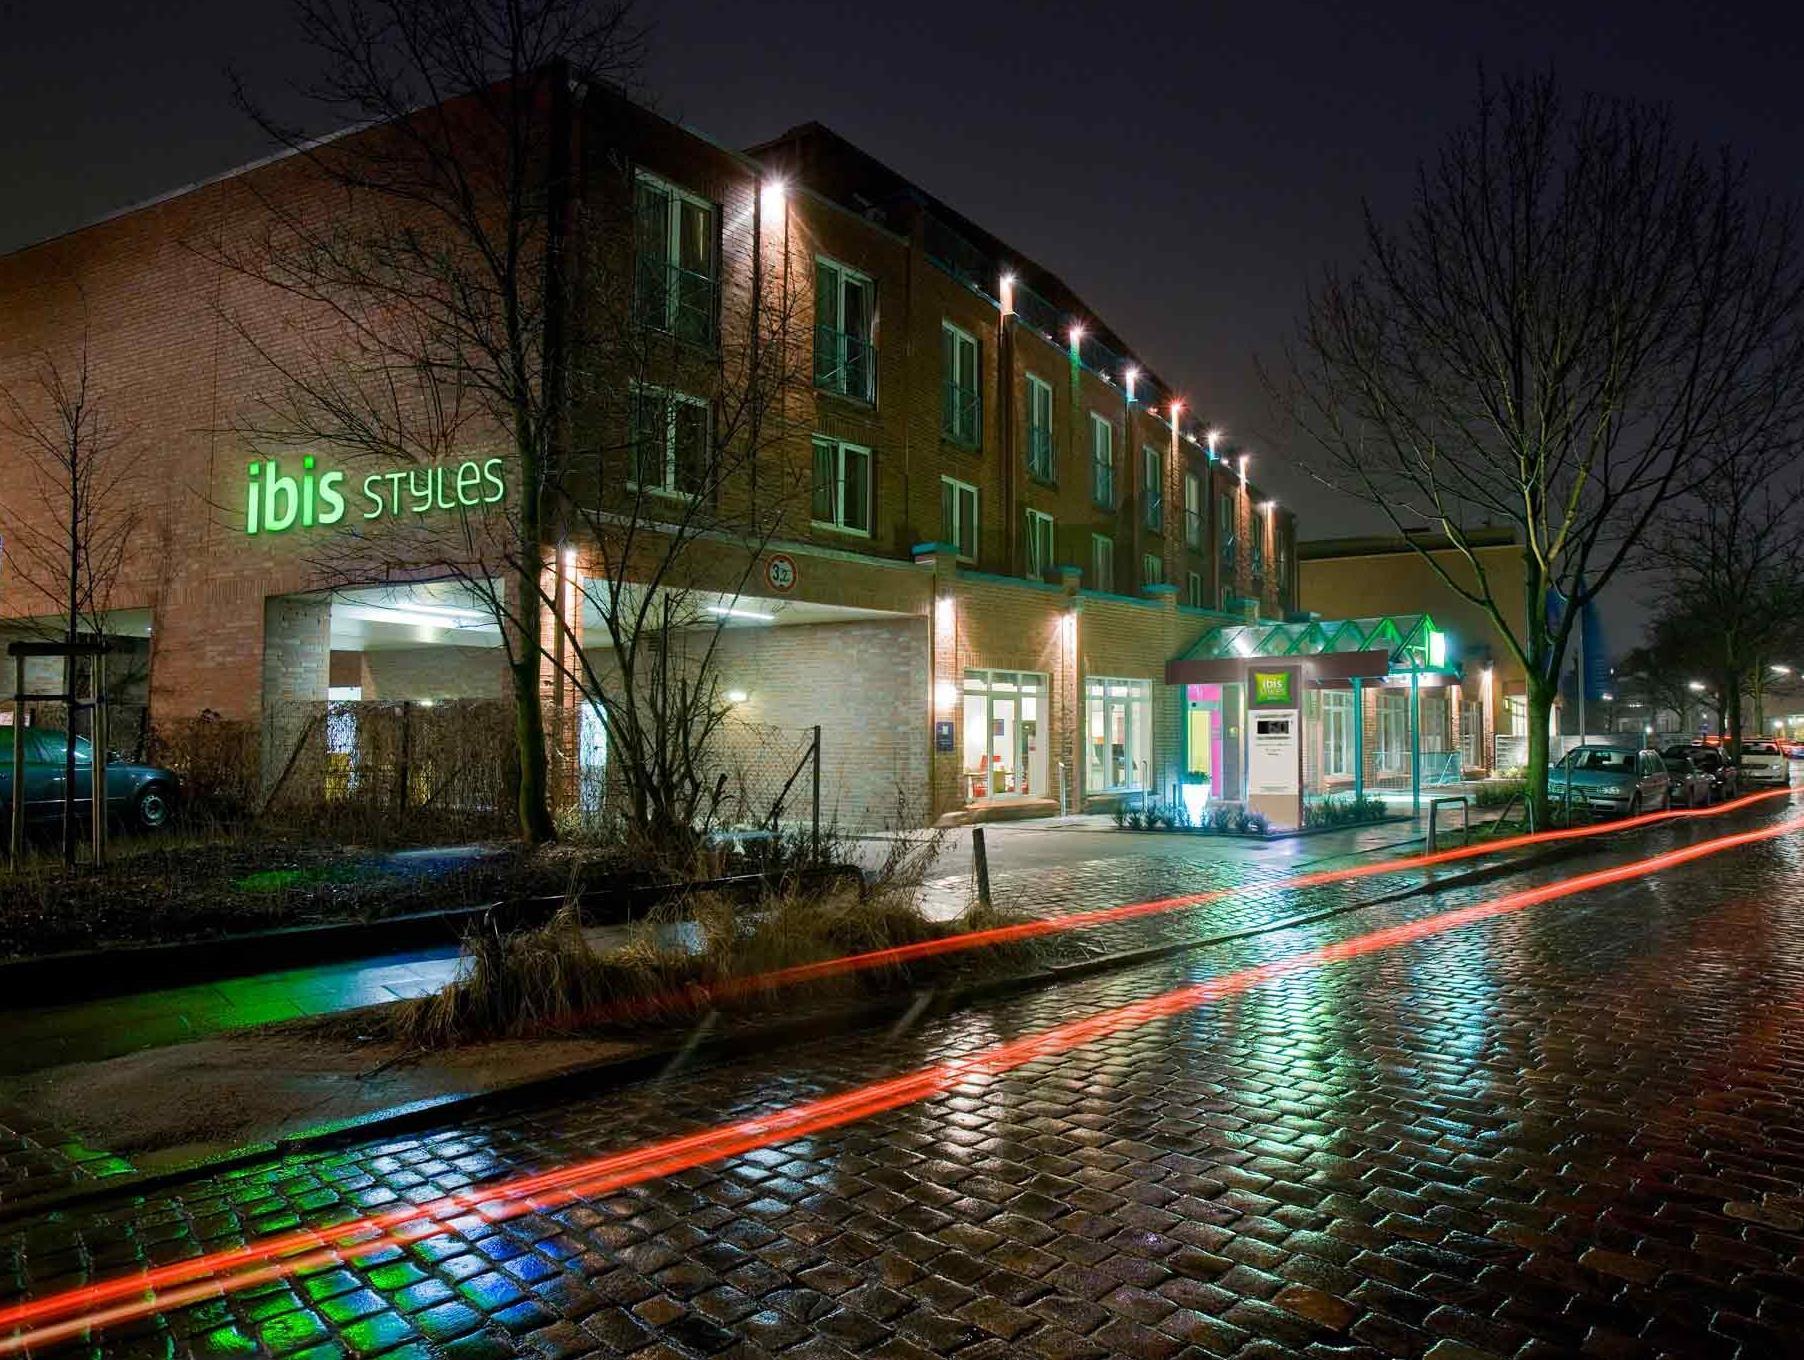 ibis styles hamburg alster city hamburg tyskland. Black Bedroom Furniture Sets. Home Design Ideas